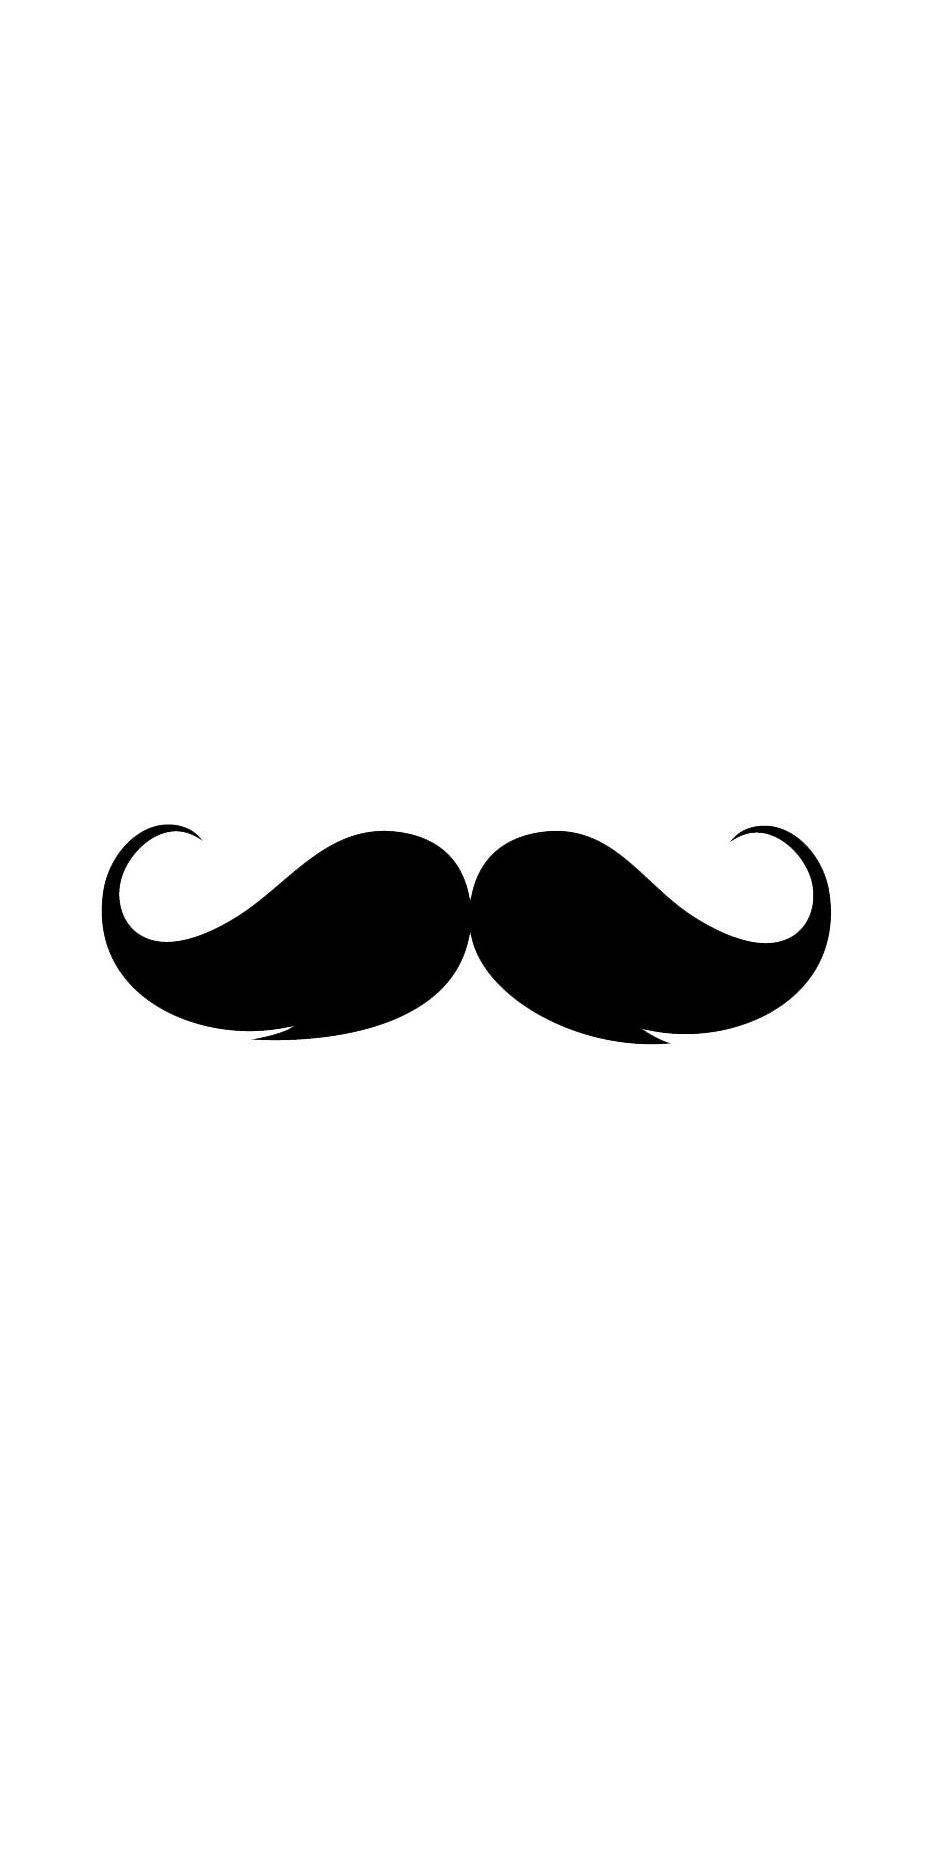 Cute Mustache iPhone Wallpapers - Top